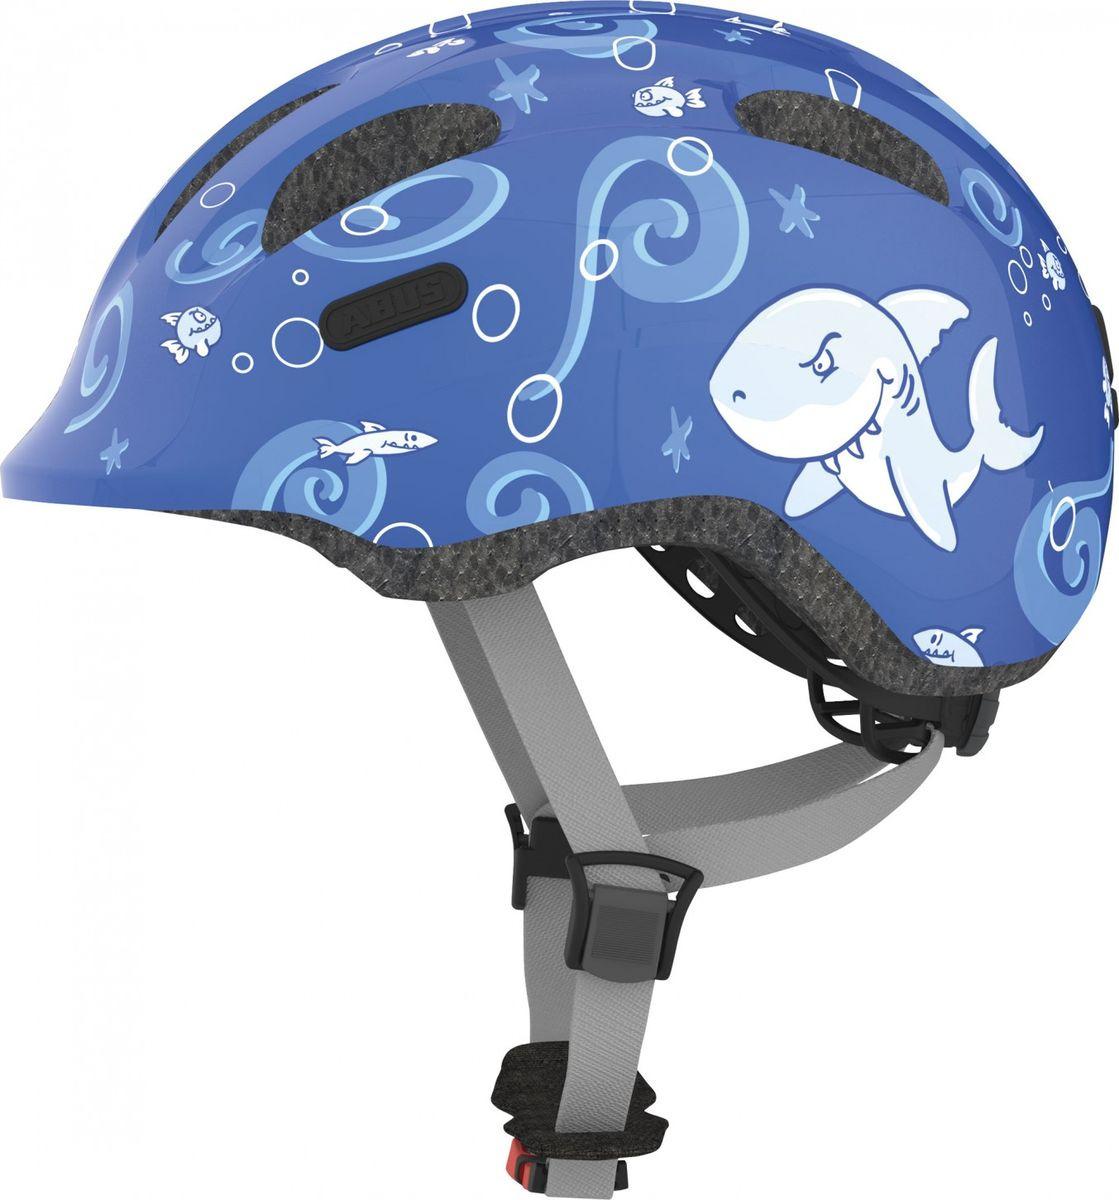 Шлем защитный Abus Smiley 2.0 Акулы, синий, размер S (45-50) велошлем детский abus smiley пчелы размер m 50 55